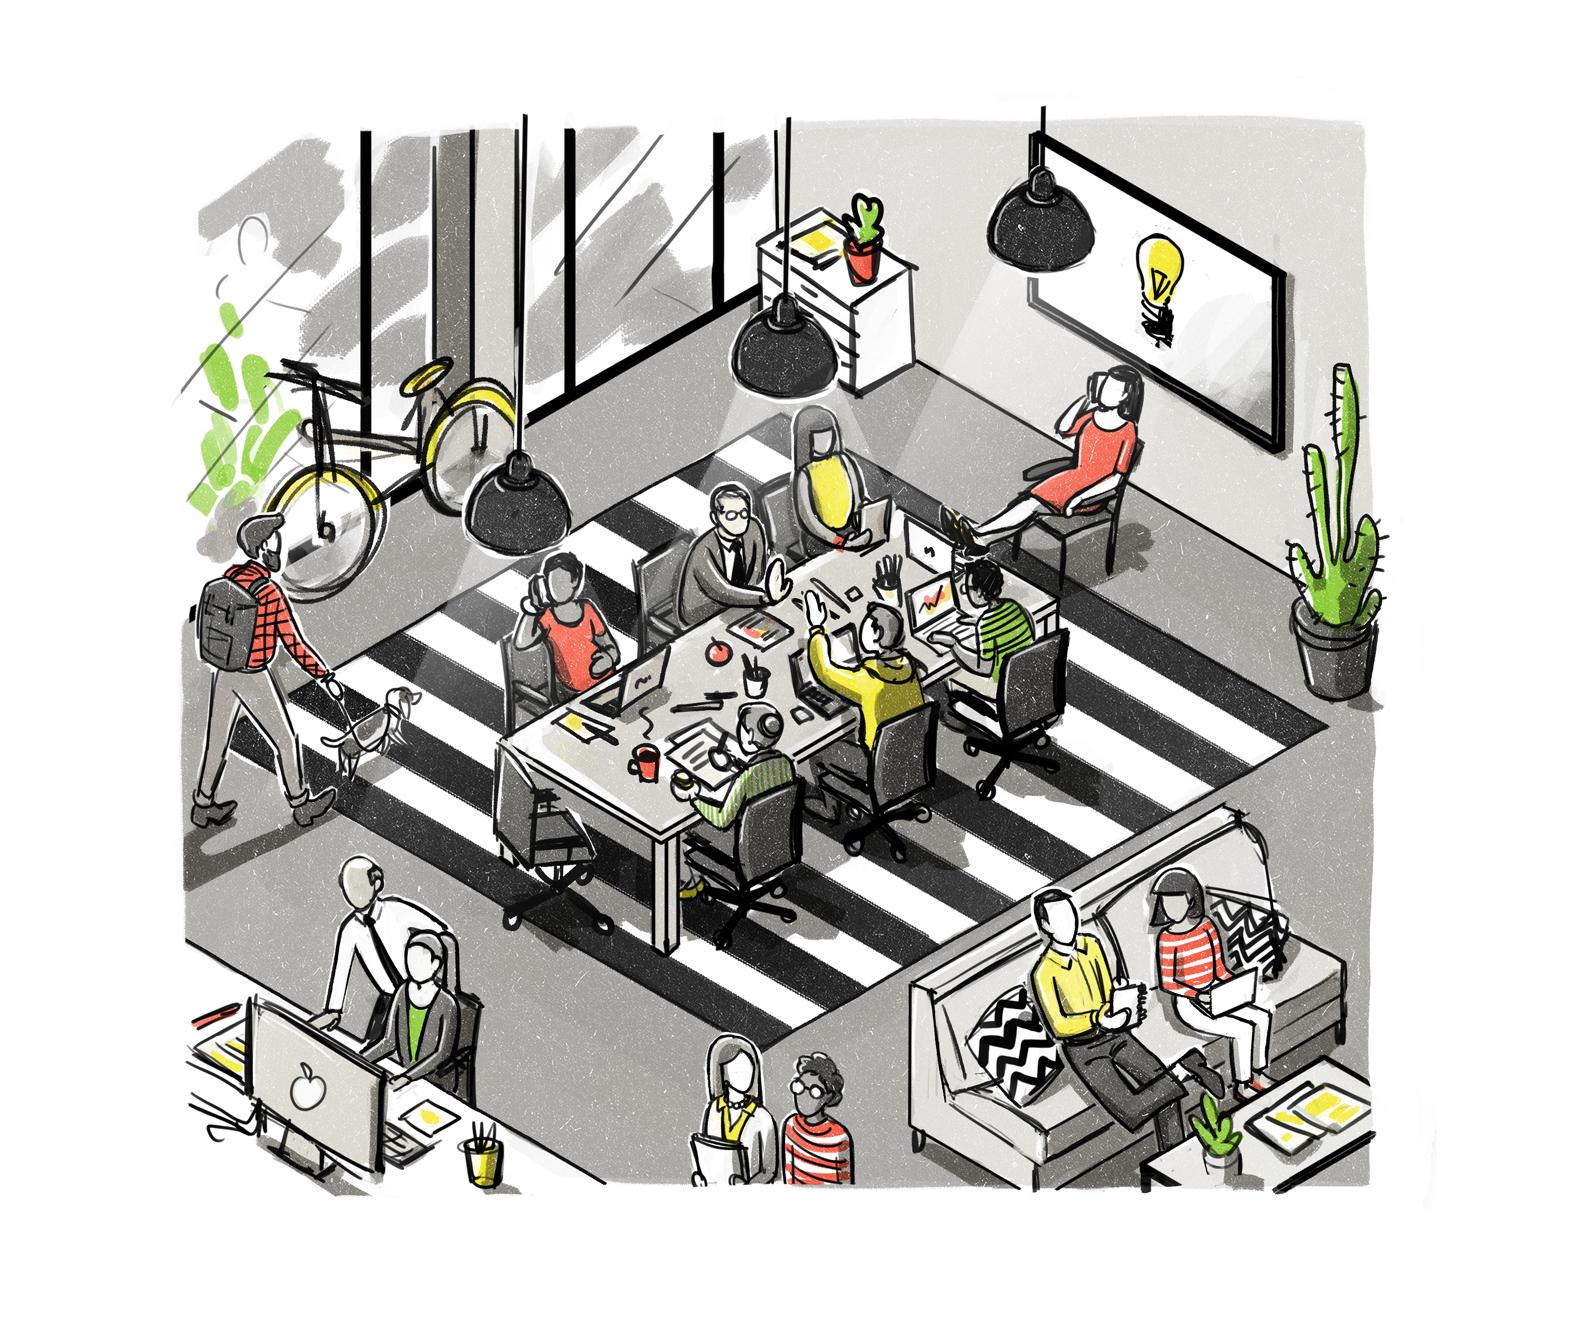 danae diaz illustration generations workspace